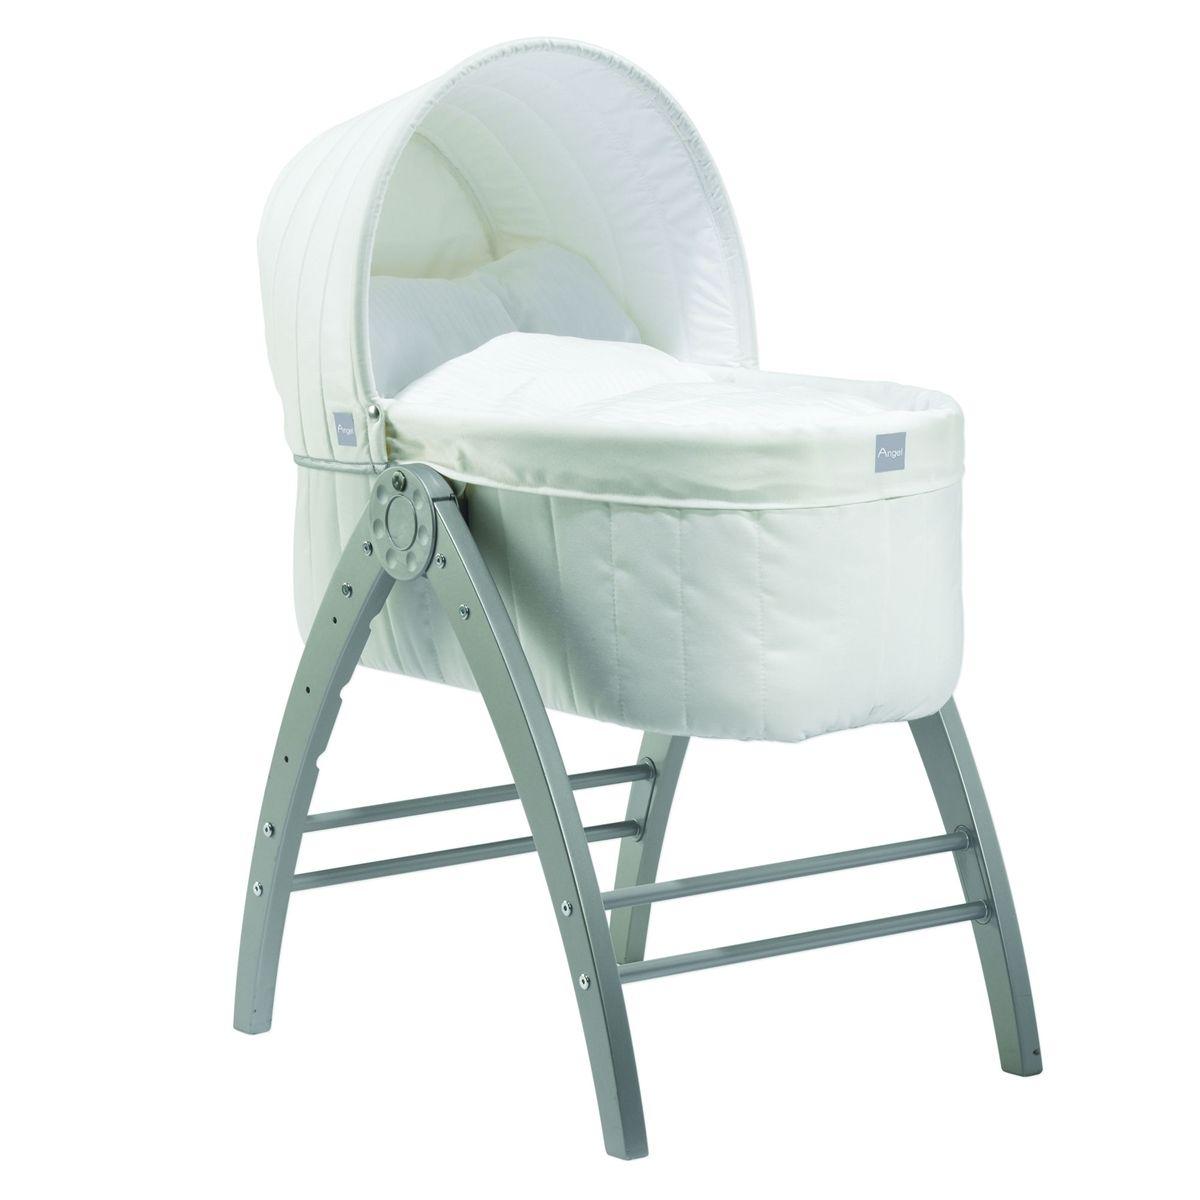 Osta BabyDan Angel Nest Kehto, Hopea | Lastenhuone Lastensängyt | Jollyroom